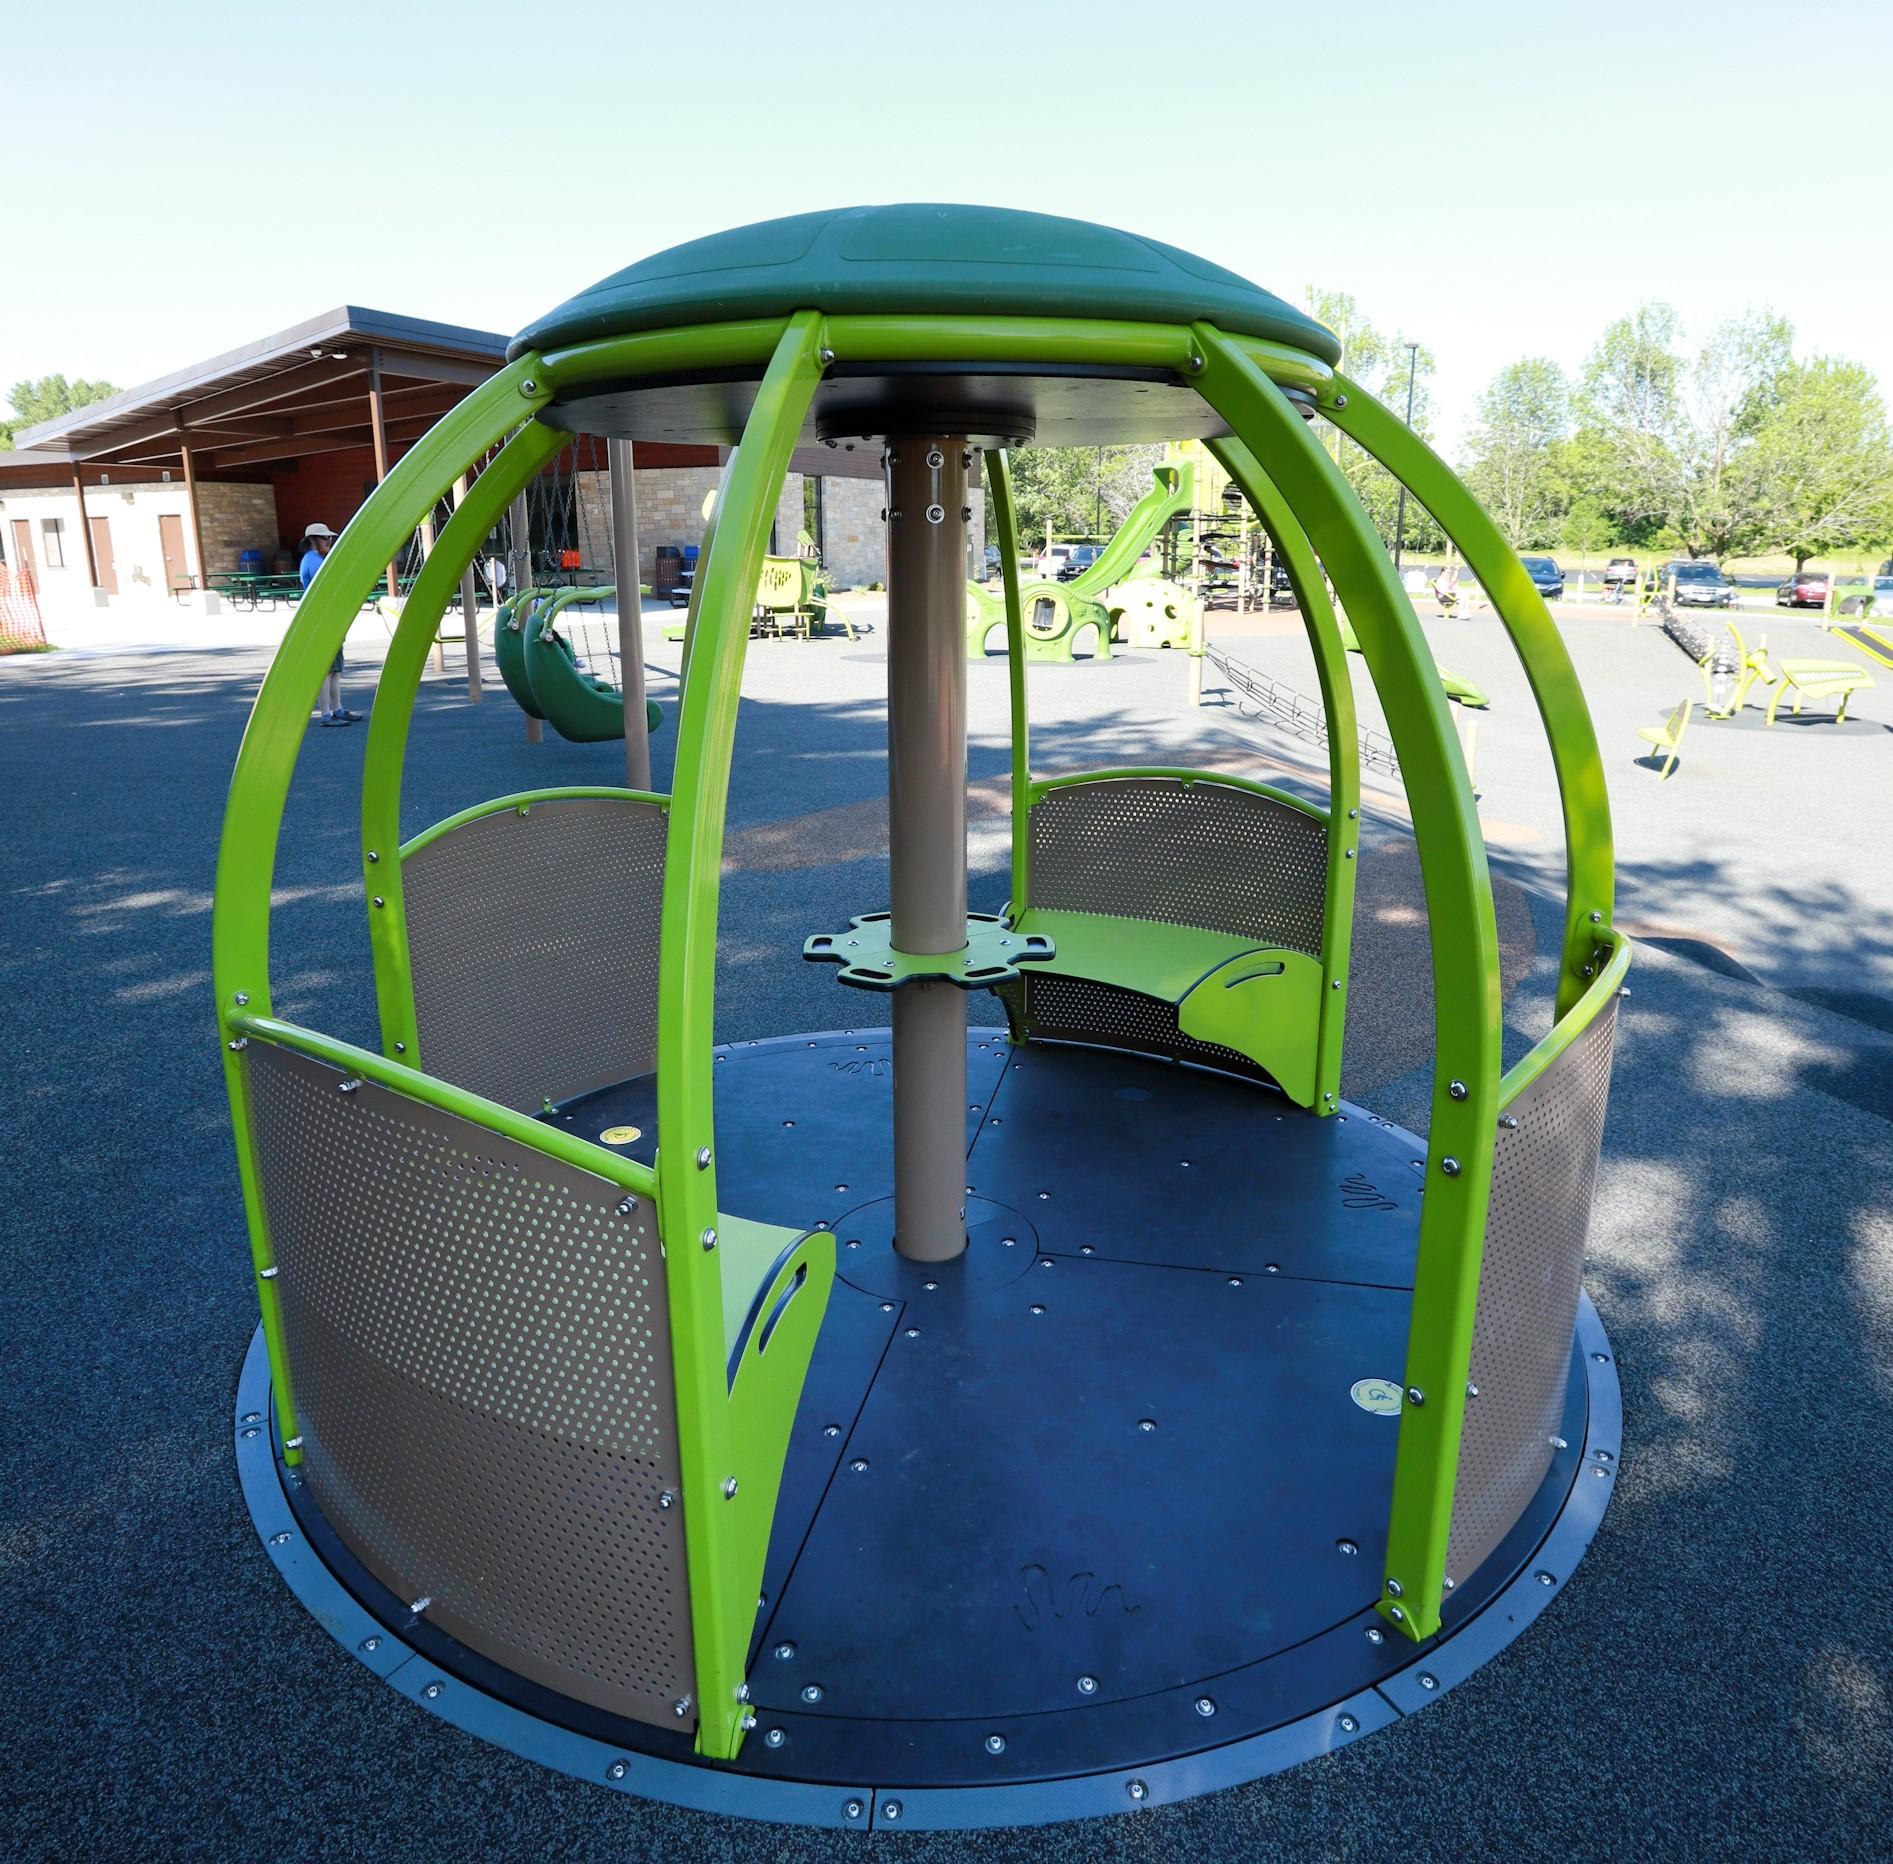 The Grove Playground Merry-go-Round